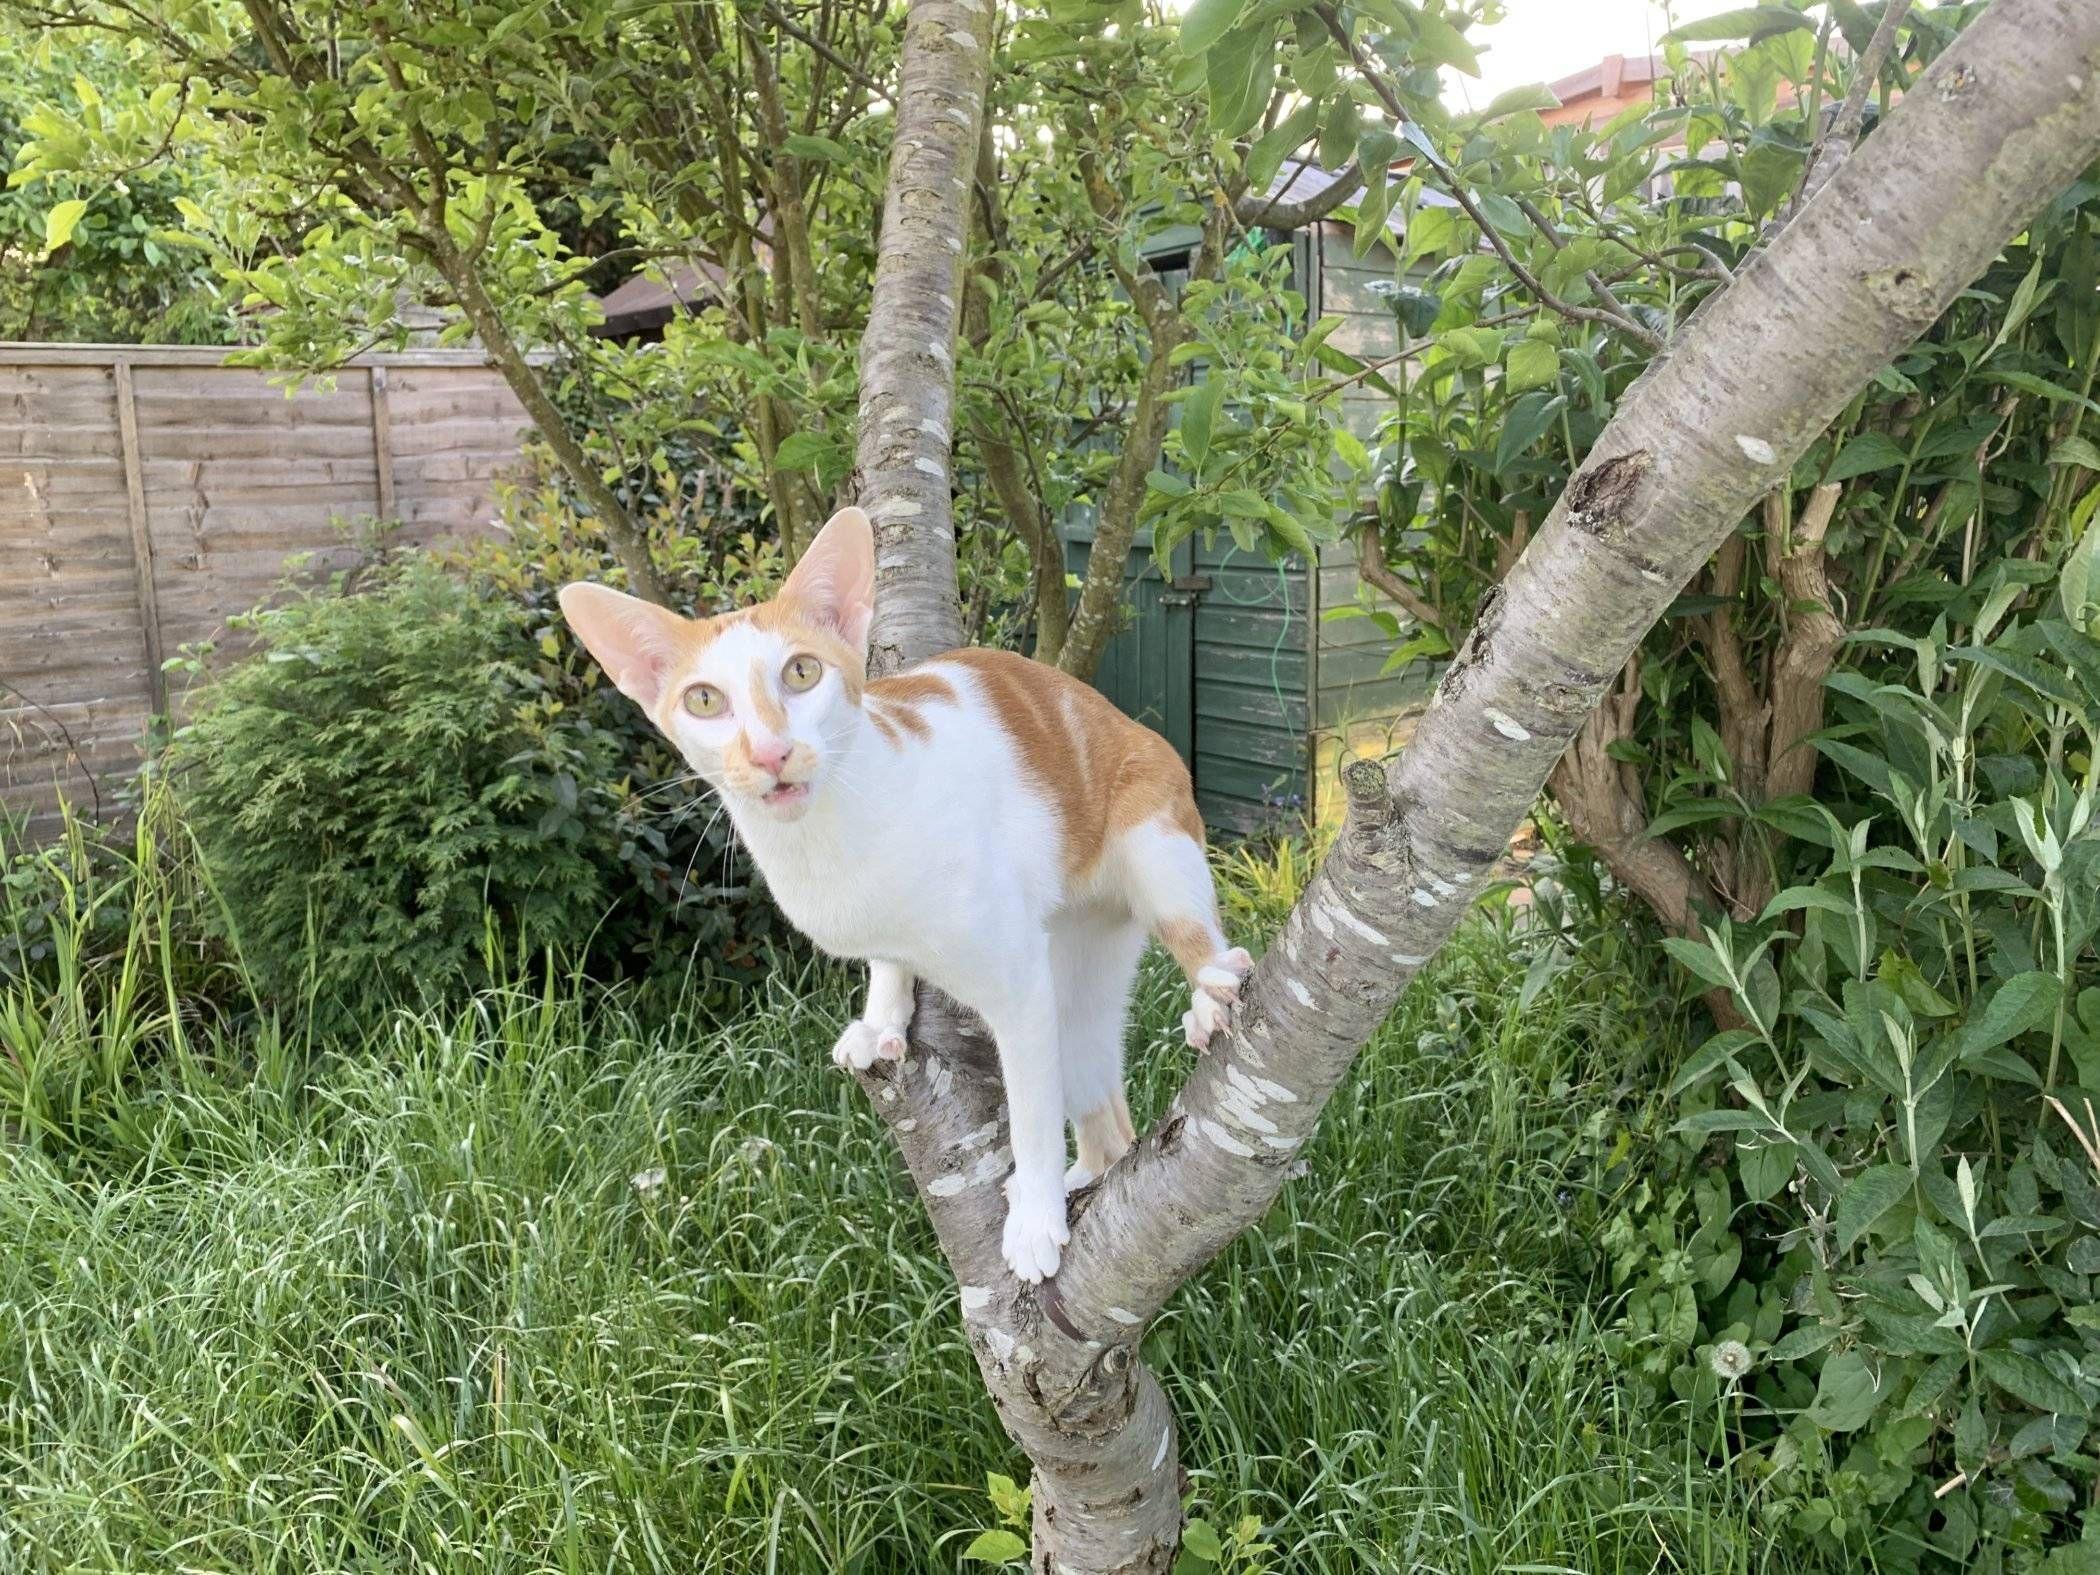 Renegade The Tree Kingdom Pet News Animal Stories Kittens Cutest